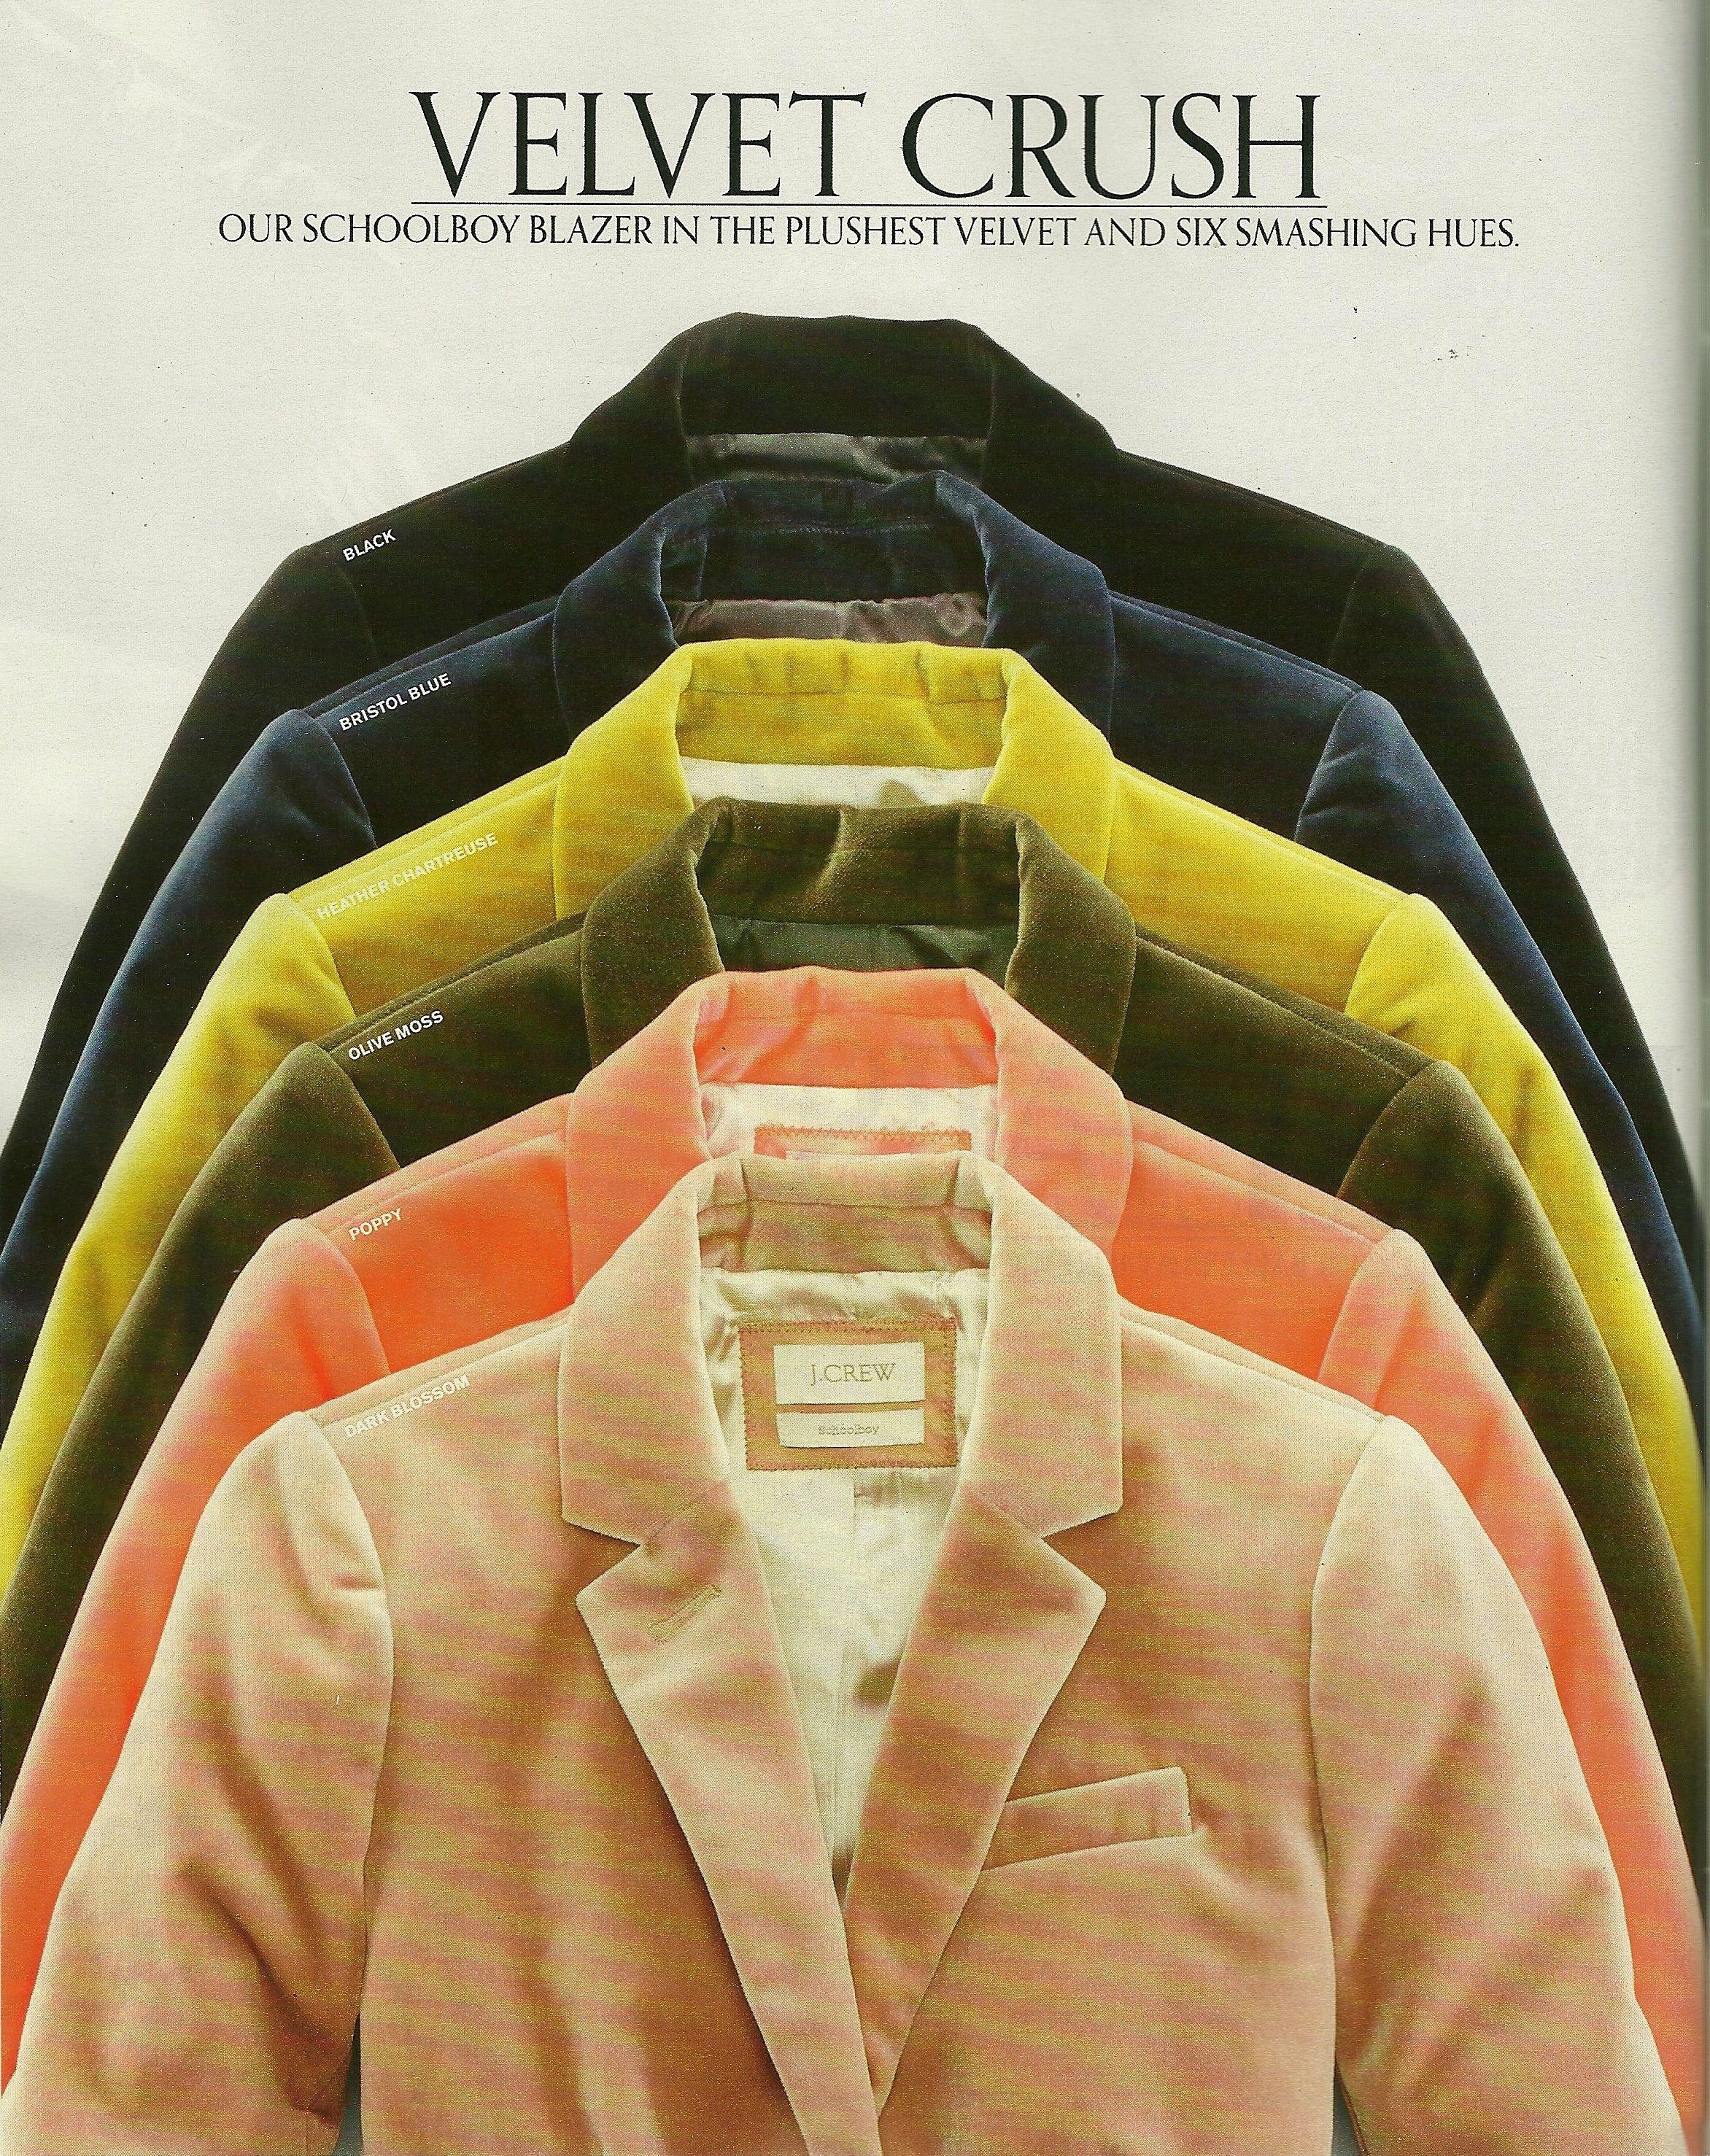 dcf3efaaa7f J. Crew October 2011 catalog - Velvet Schoolboy Blazer. See the full  catalog at